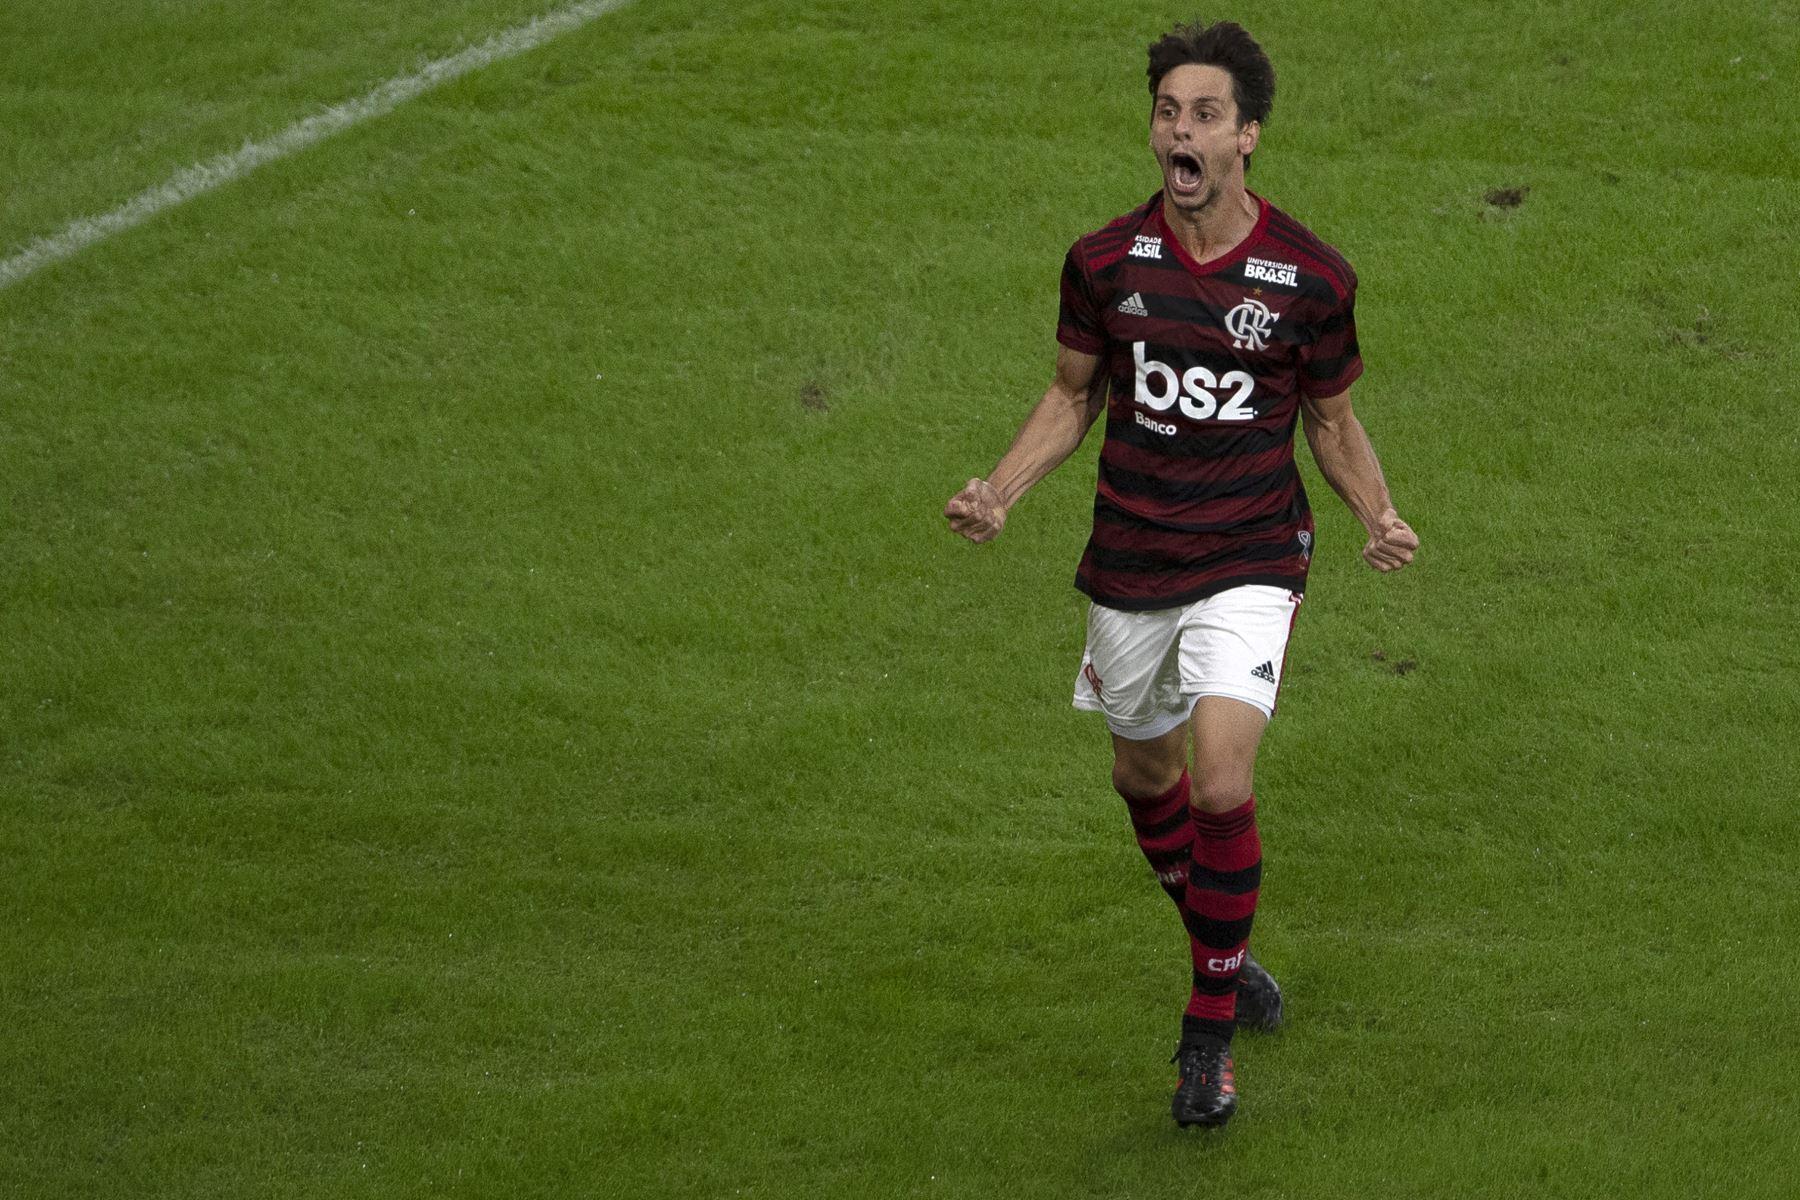 Rodrigo Caio Fecha de nacimiento: 17/08/1993 (26) Valor de mercado: € 6